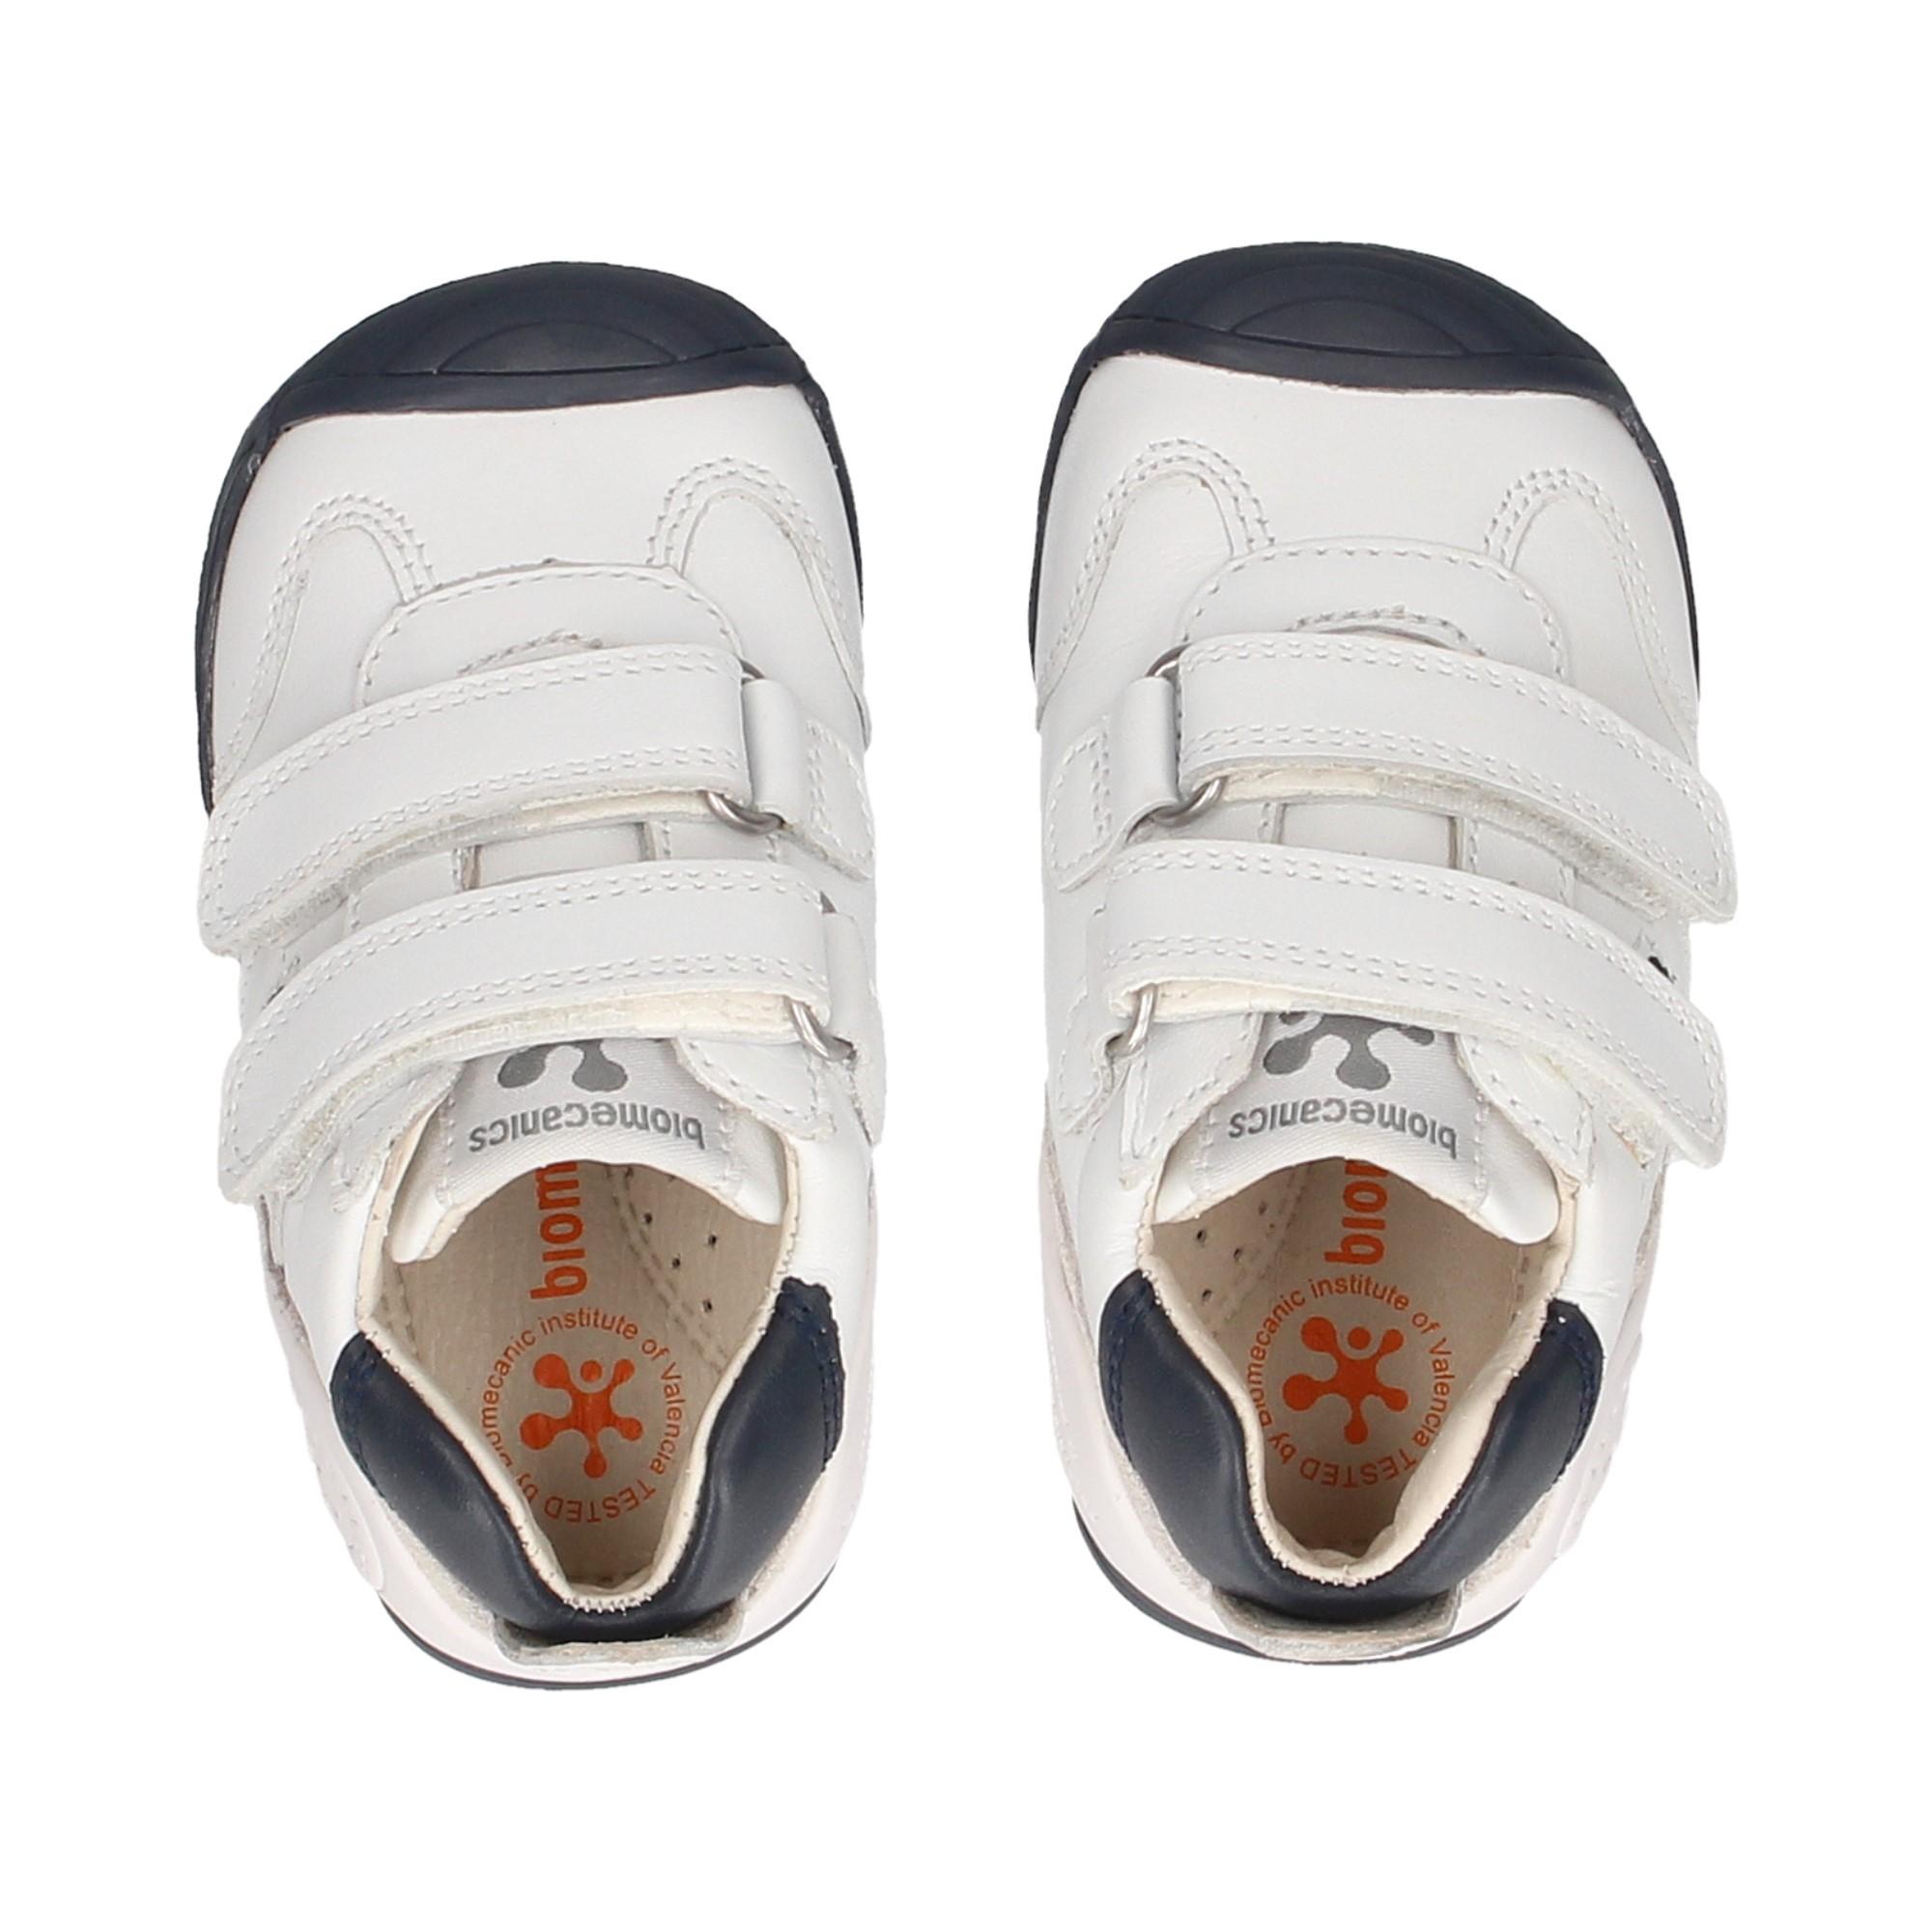 sports-2-white-blue-velcros